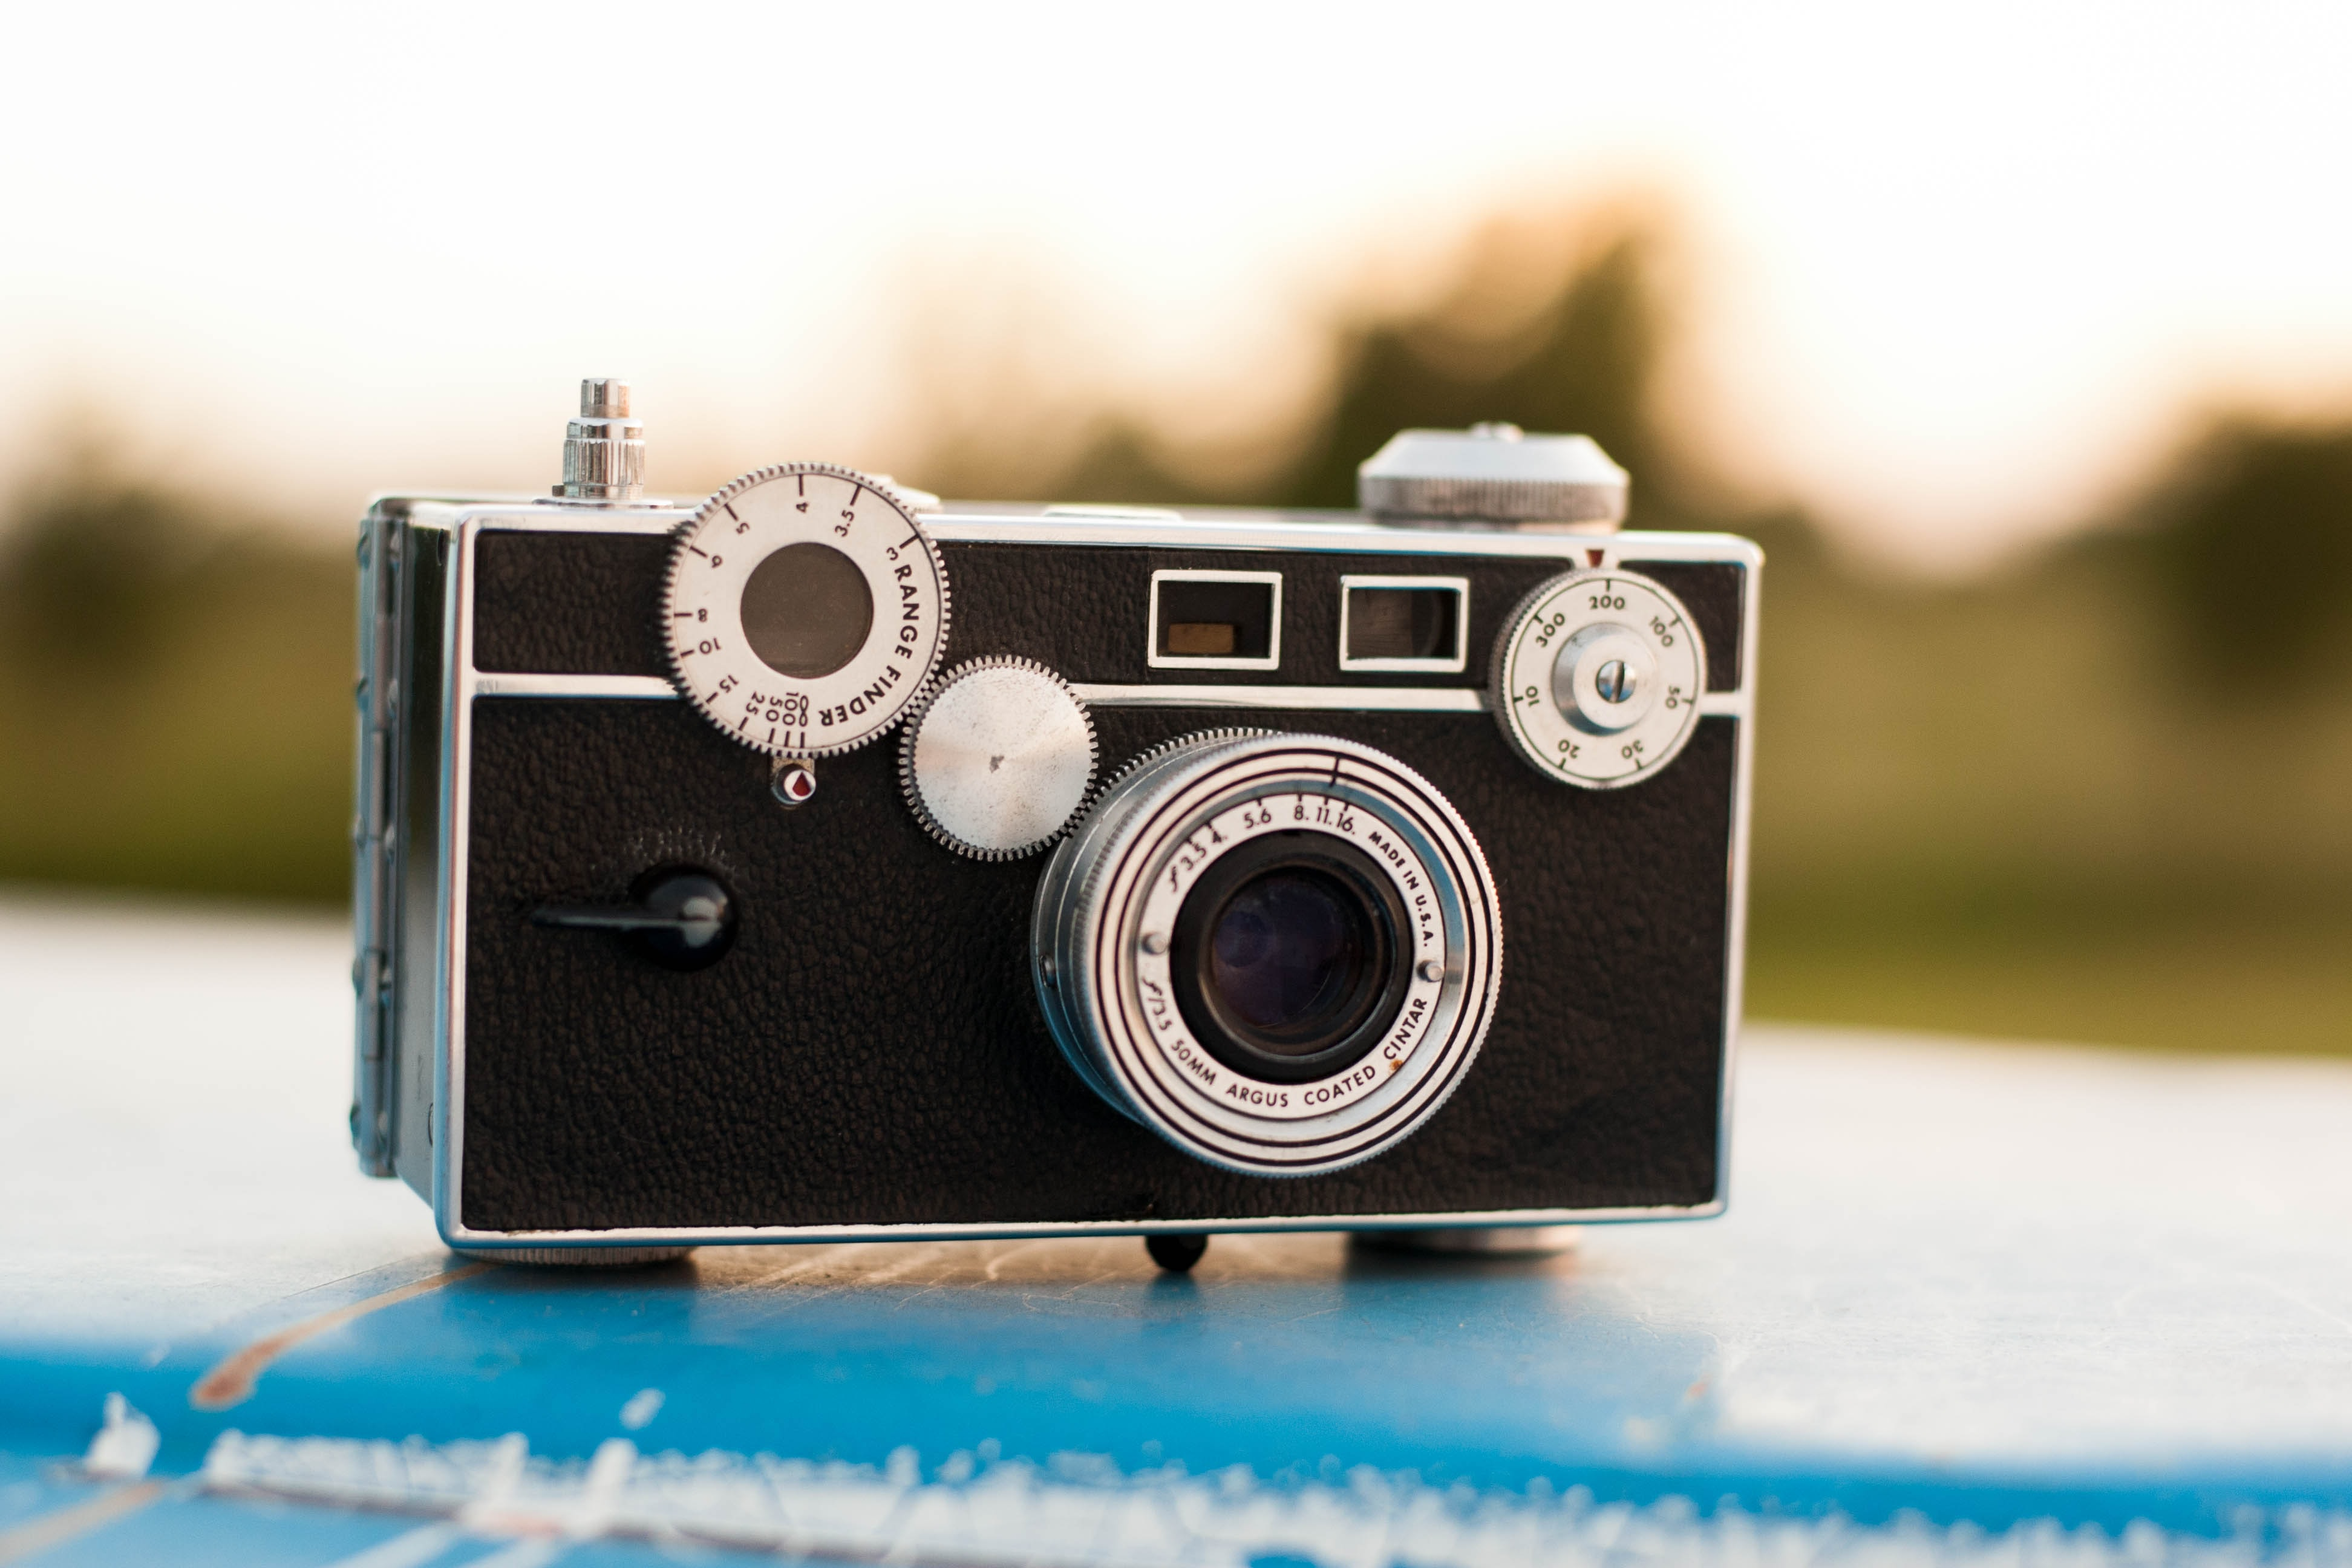 Vintage camera with a range finder and Argus Coated Cinter lens on a blue surface at dusk